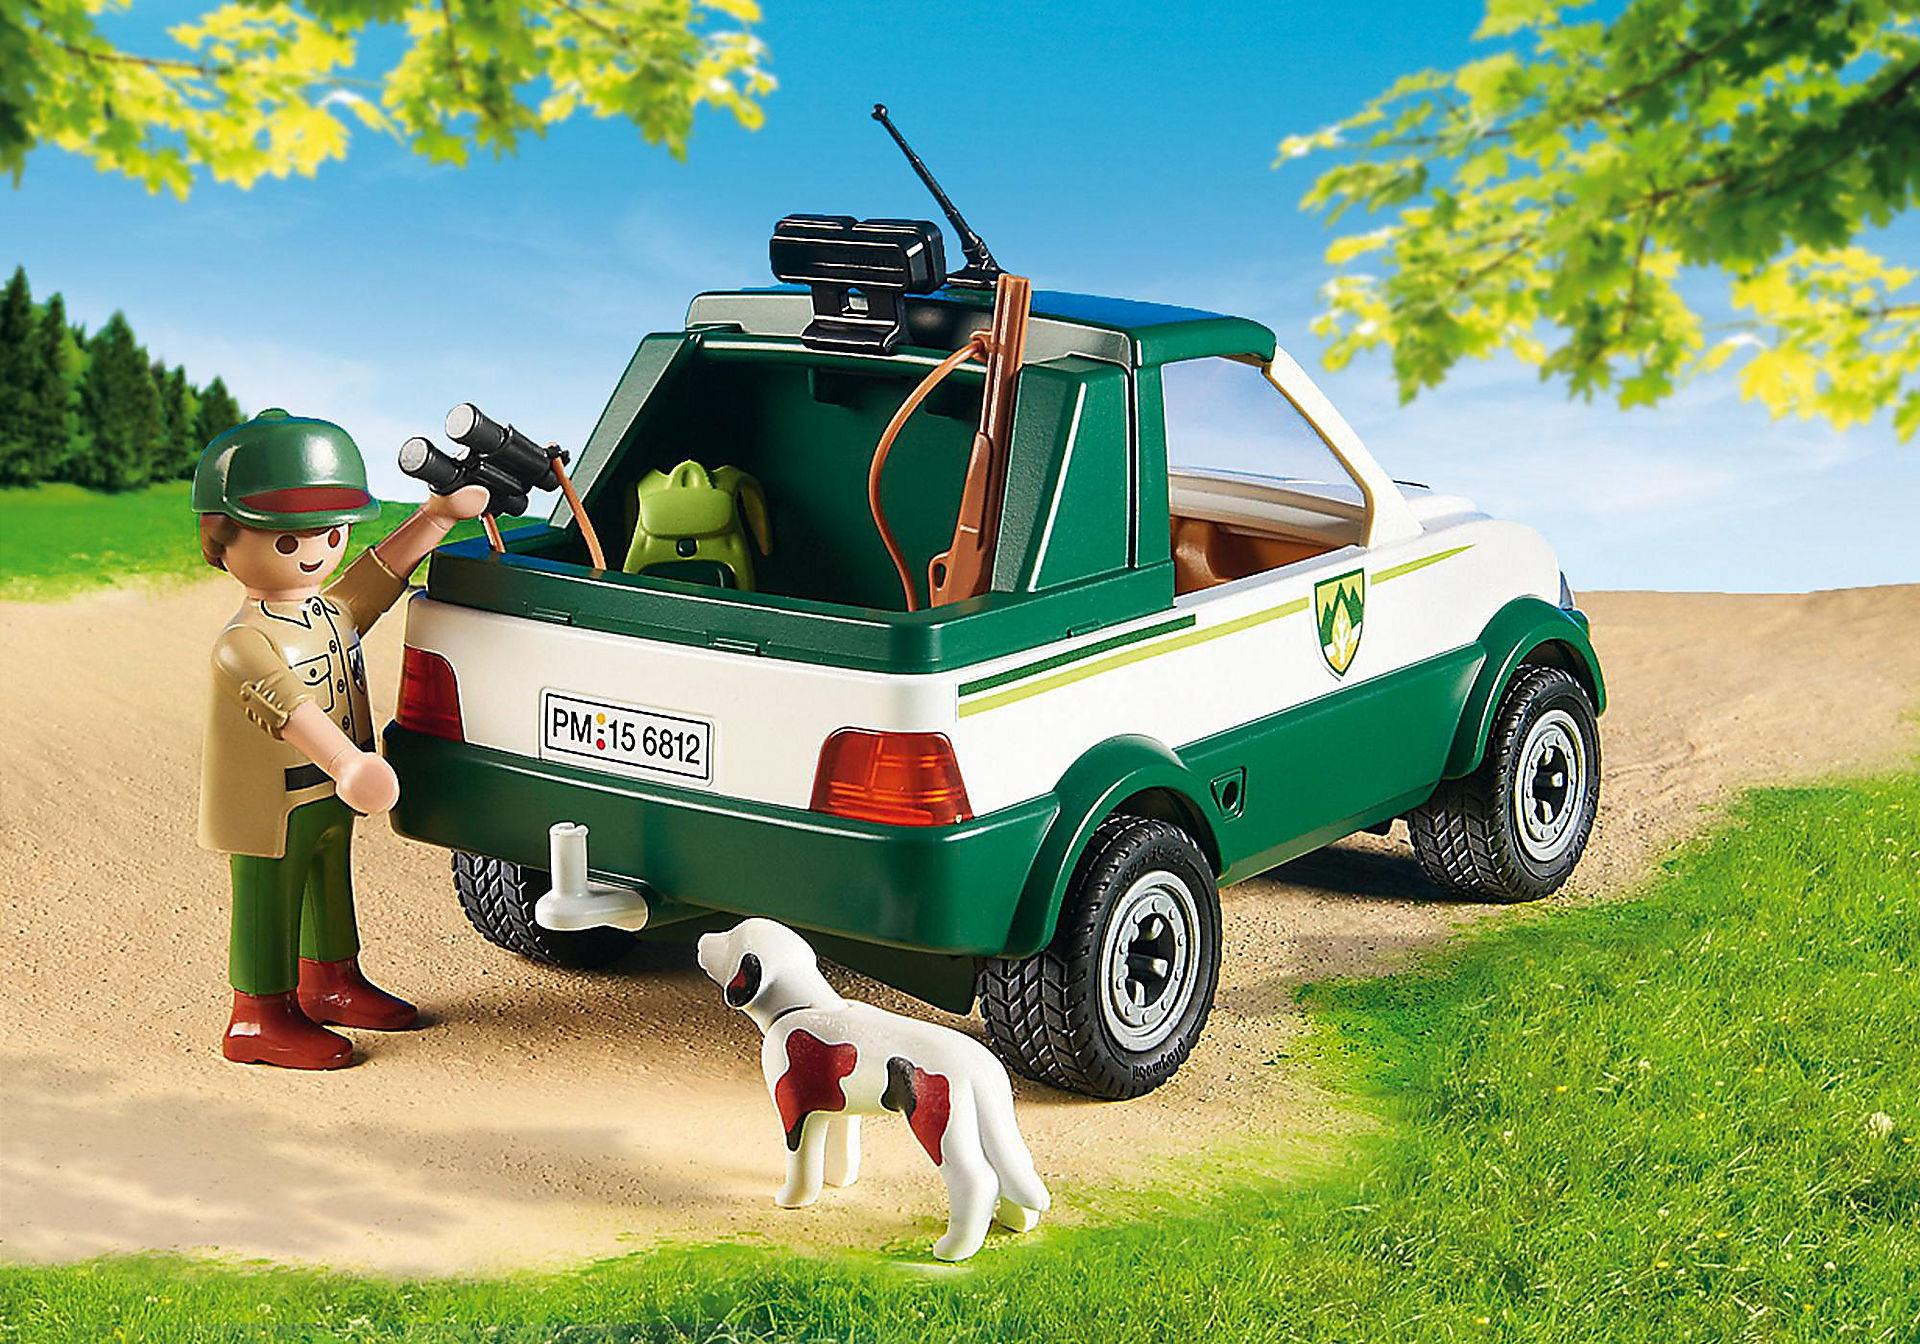 6812 Garde forestier avec pick-up zoom image5